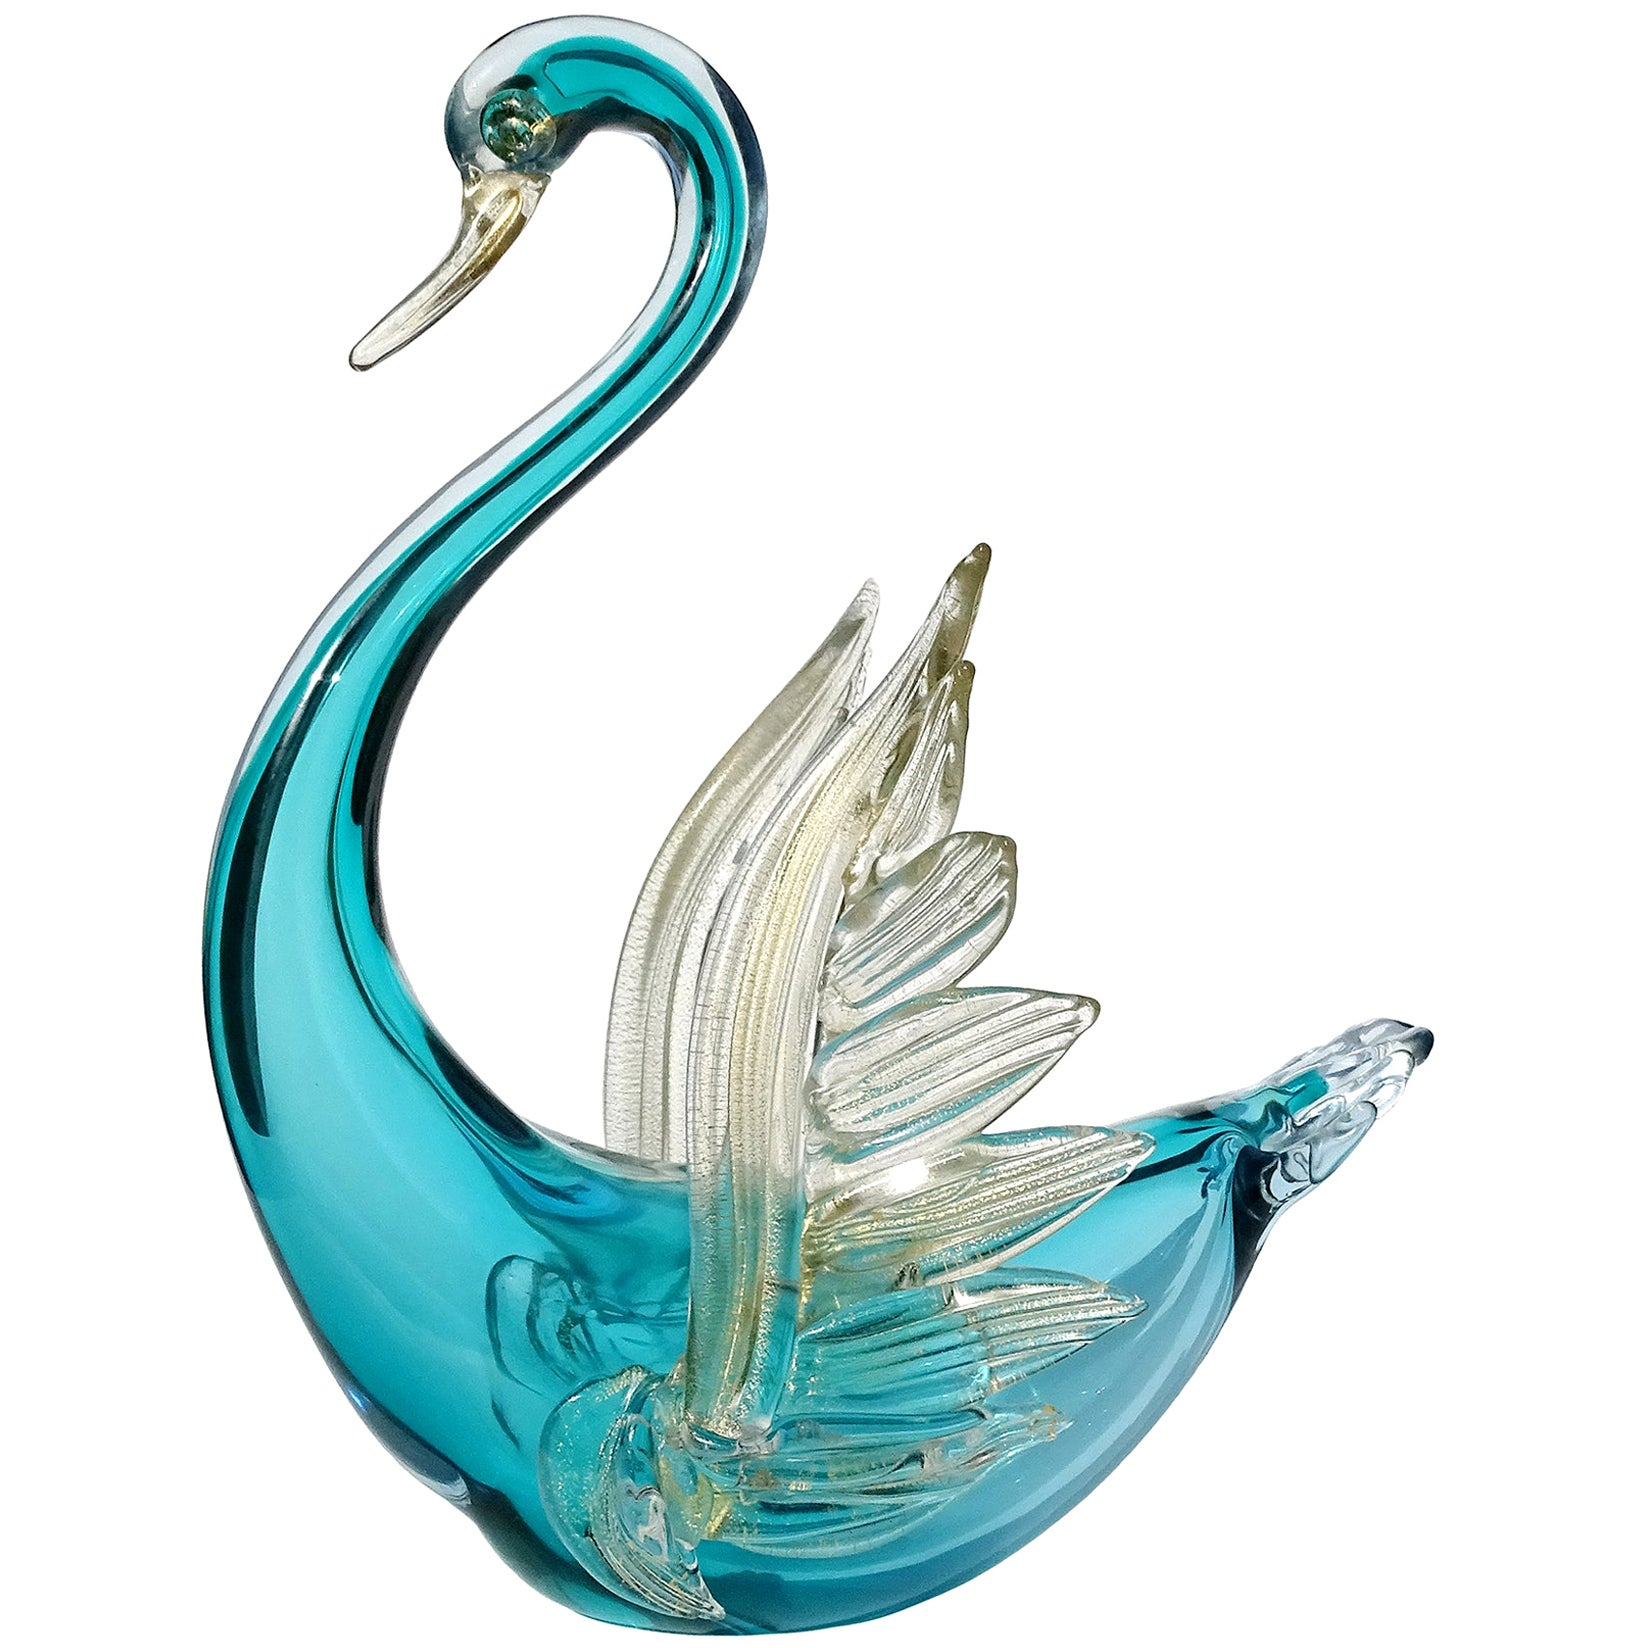 Barbini Murano Sommerso Blue Gold Flecks Italian Art Glass Swan Bird Sculpture